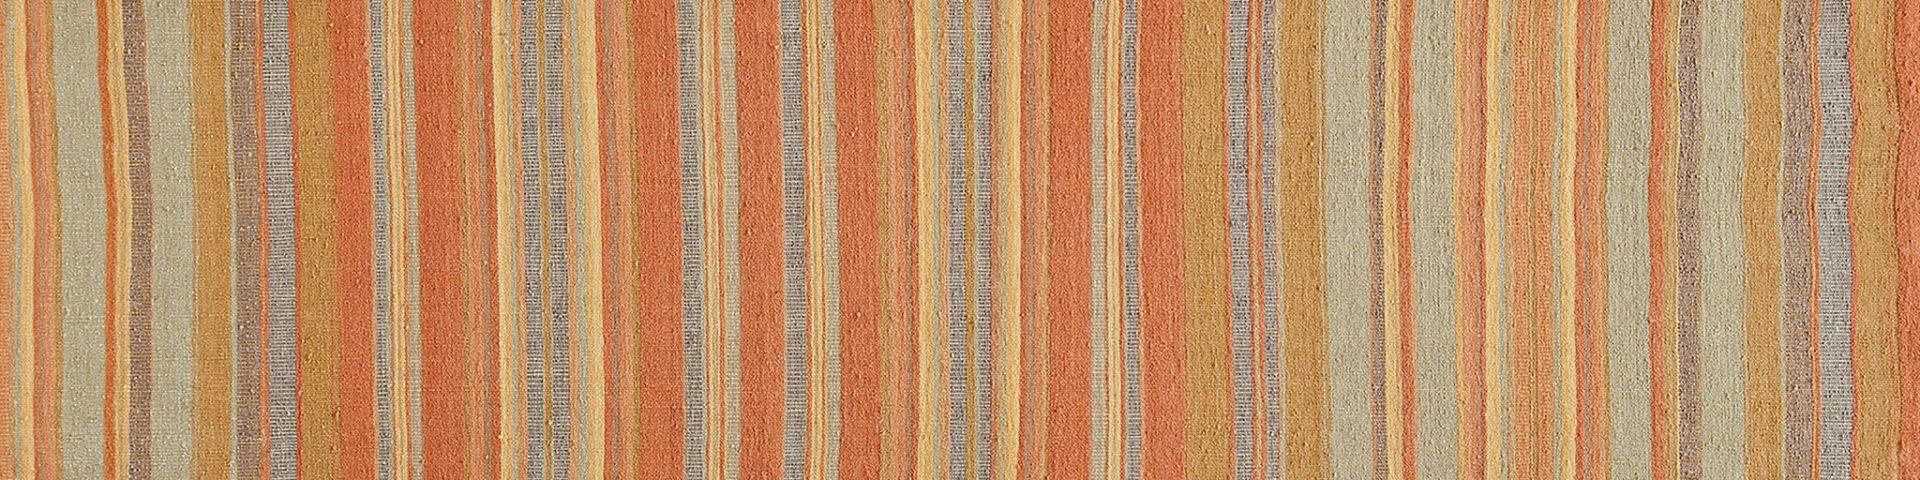 'Anatolian Stripe' by Kooches | Image courtesy of Kooches. - The Ruggist